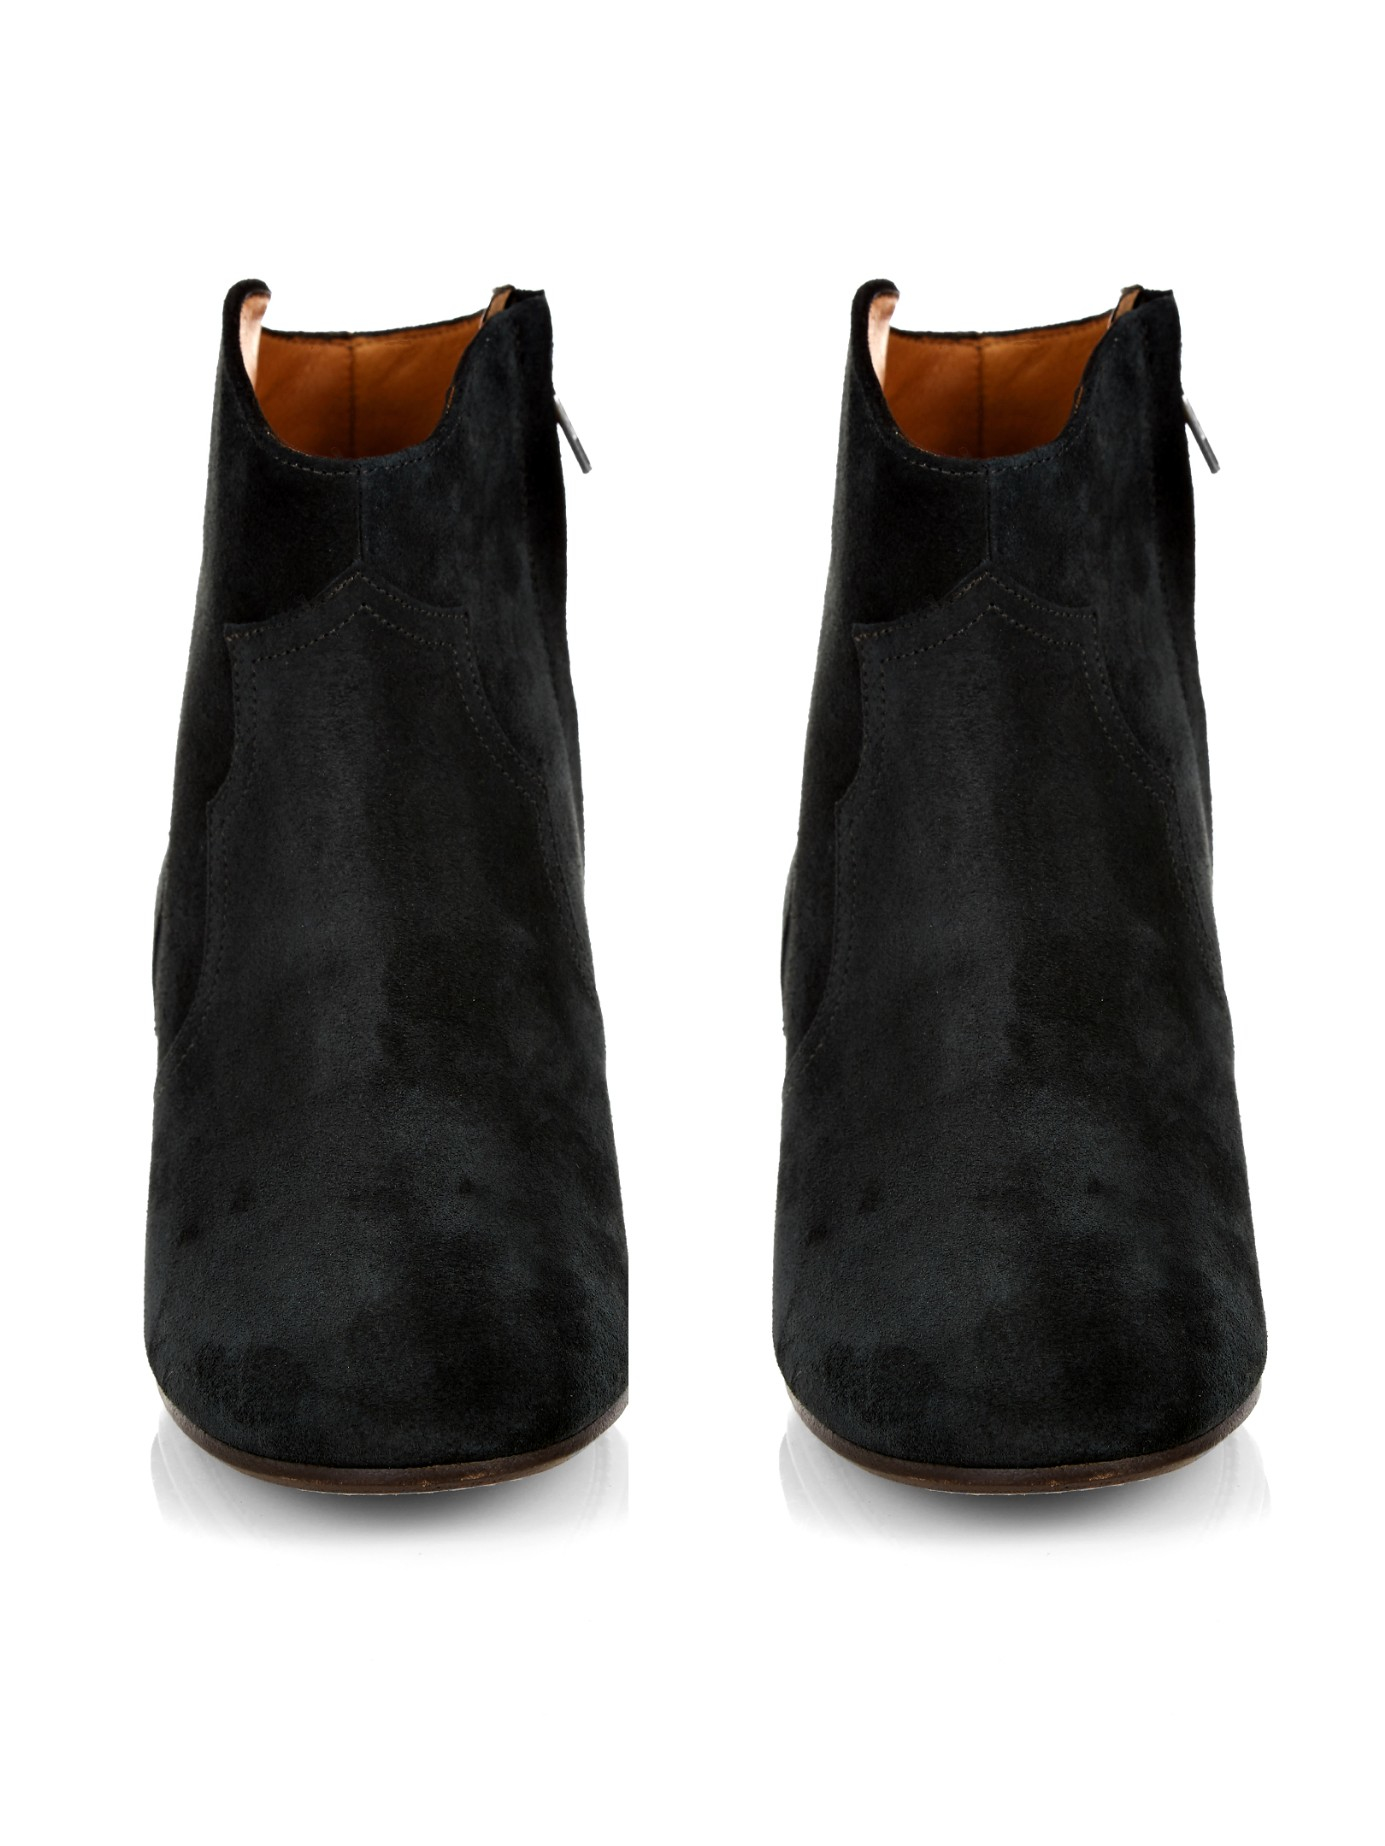 isabel marant toile dicker suede boots in black. Black Bedroom Furniture Sets. Home Design Ideas